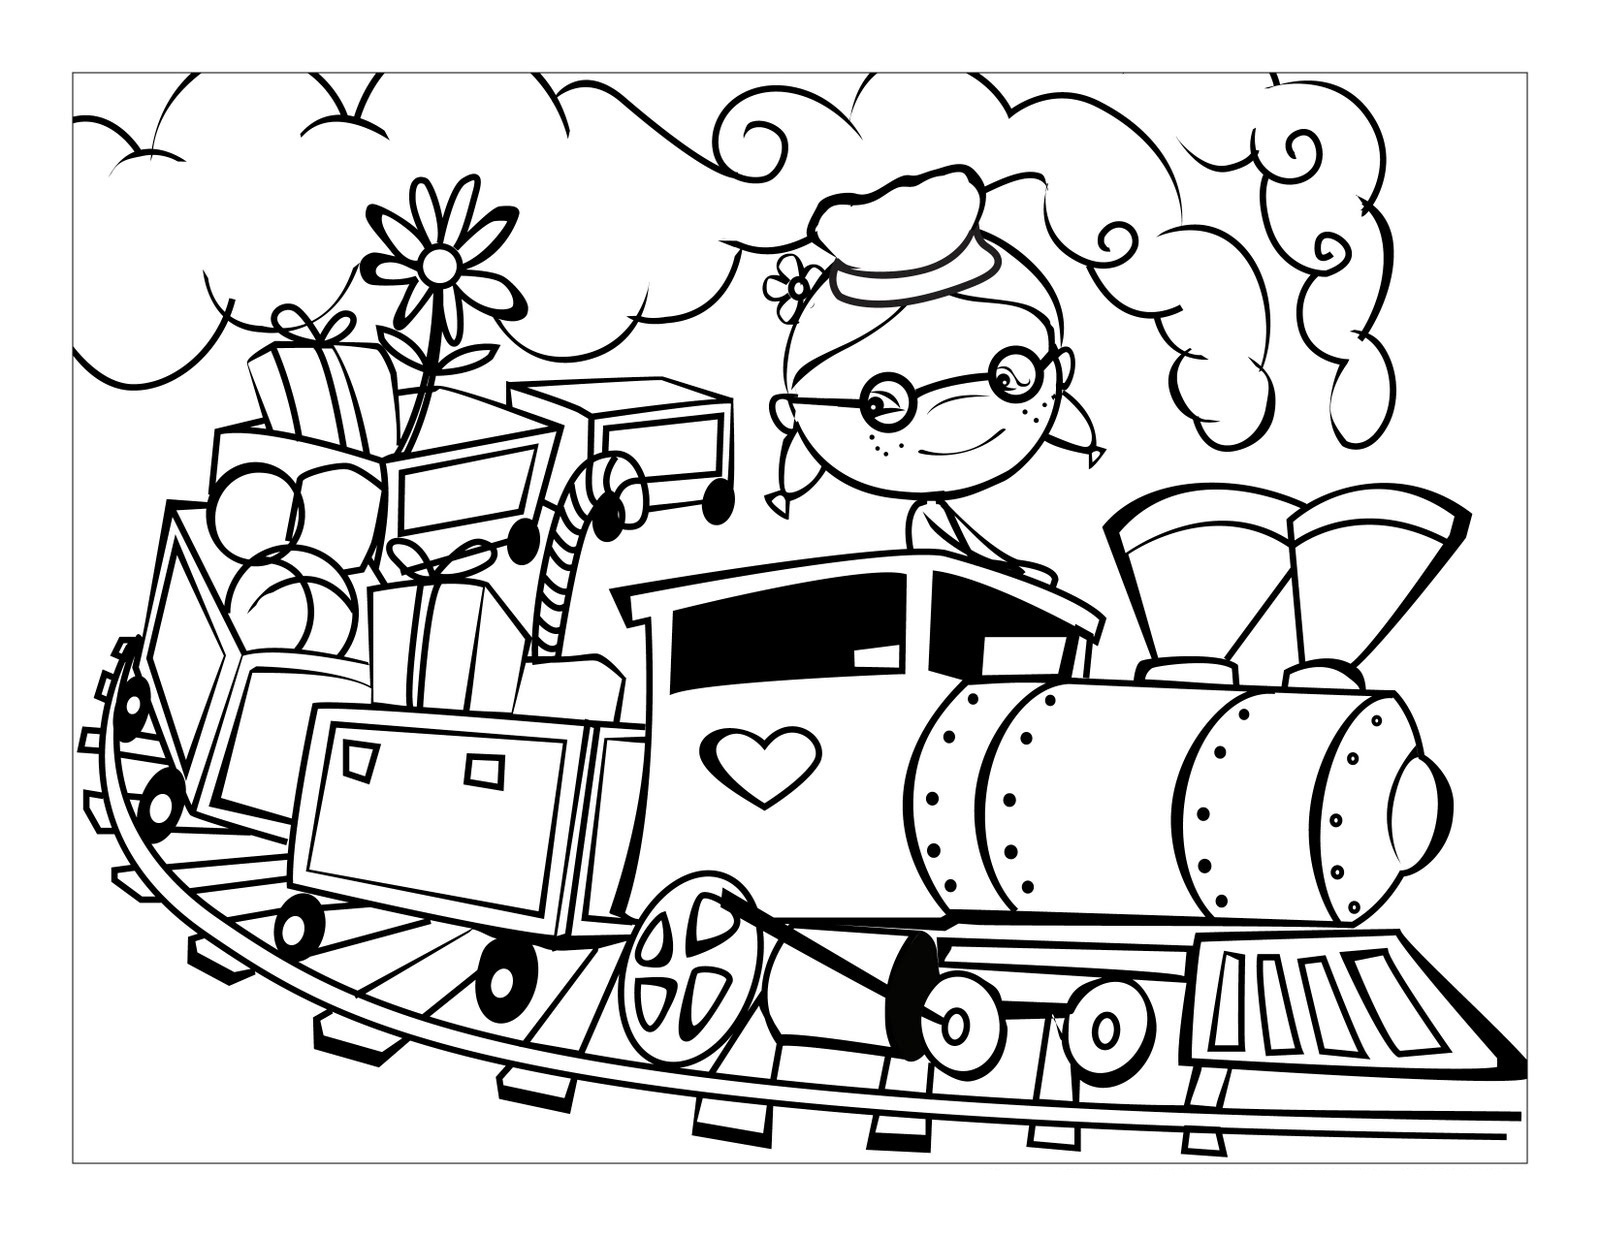 Dibujos De Trenes Para Colorear Pintar E Imprimir Gratis